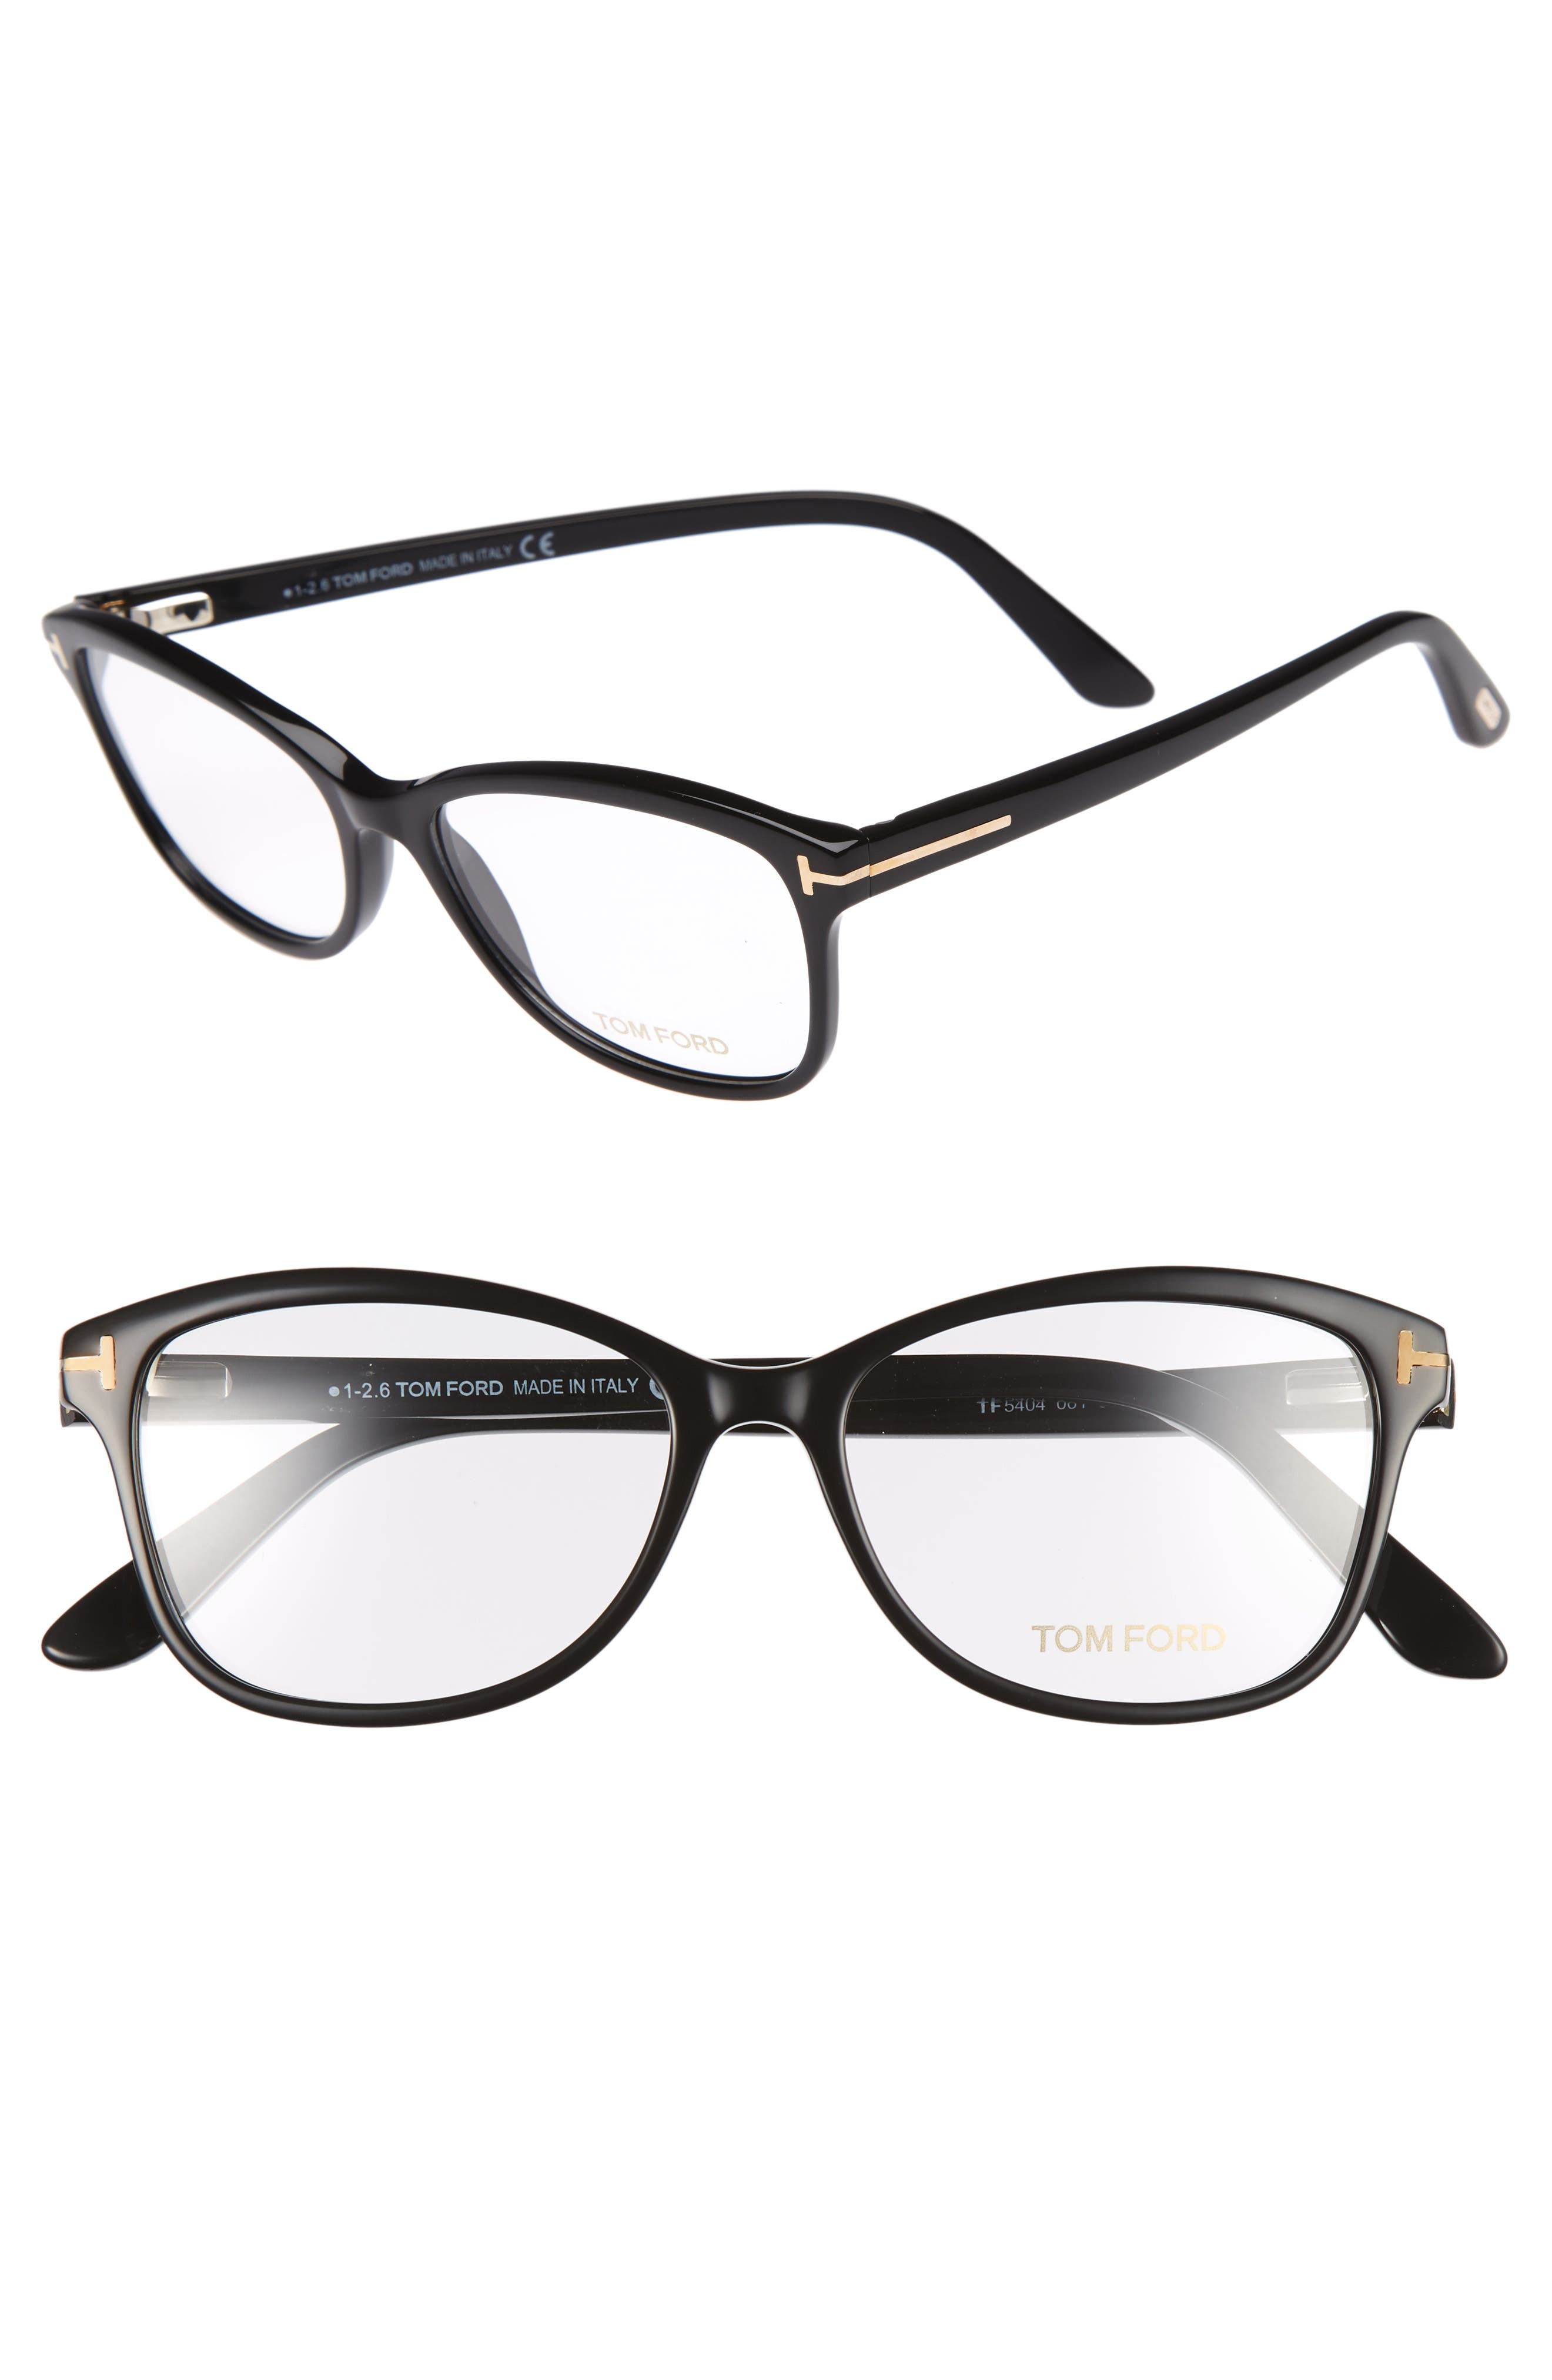 53mm Optical Glasses,                             Main thumbnail 1, color,                             SHINY BLACK